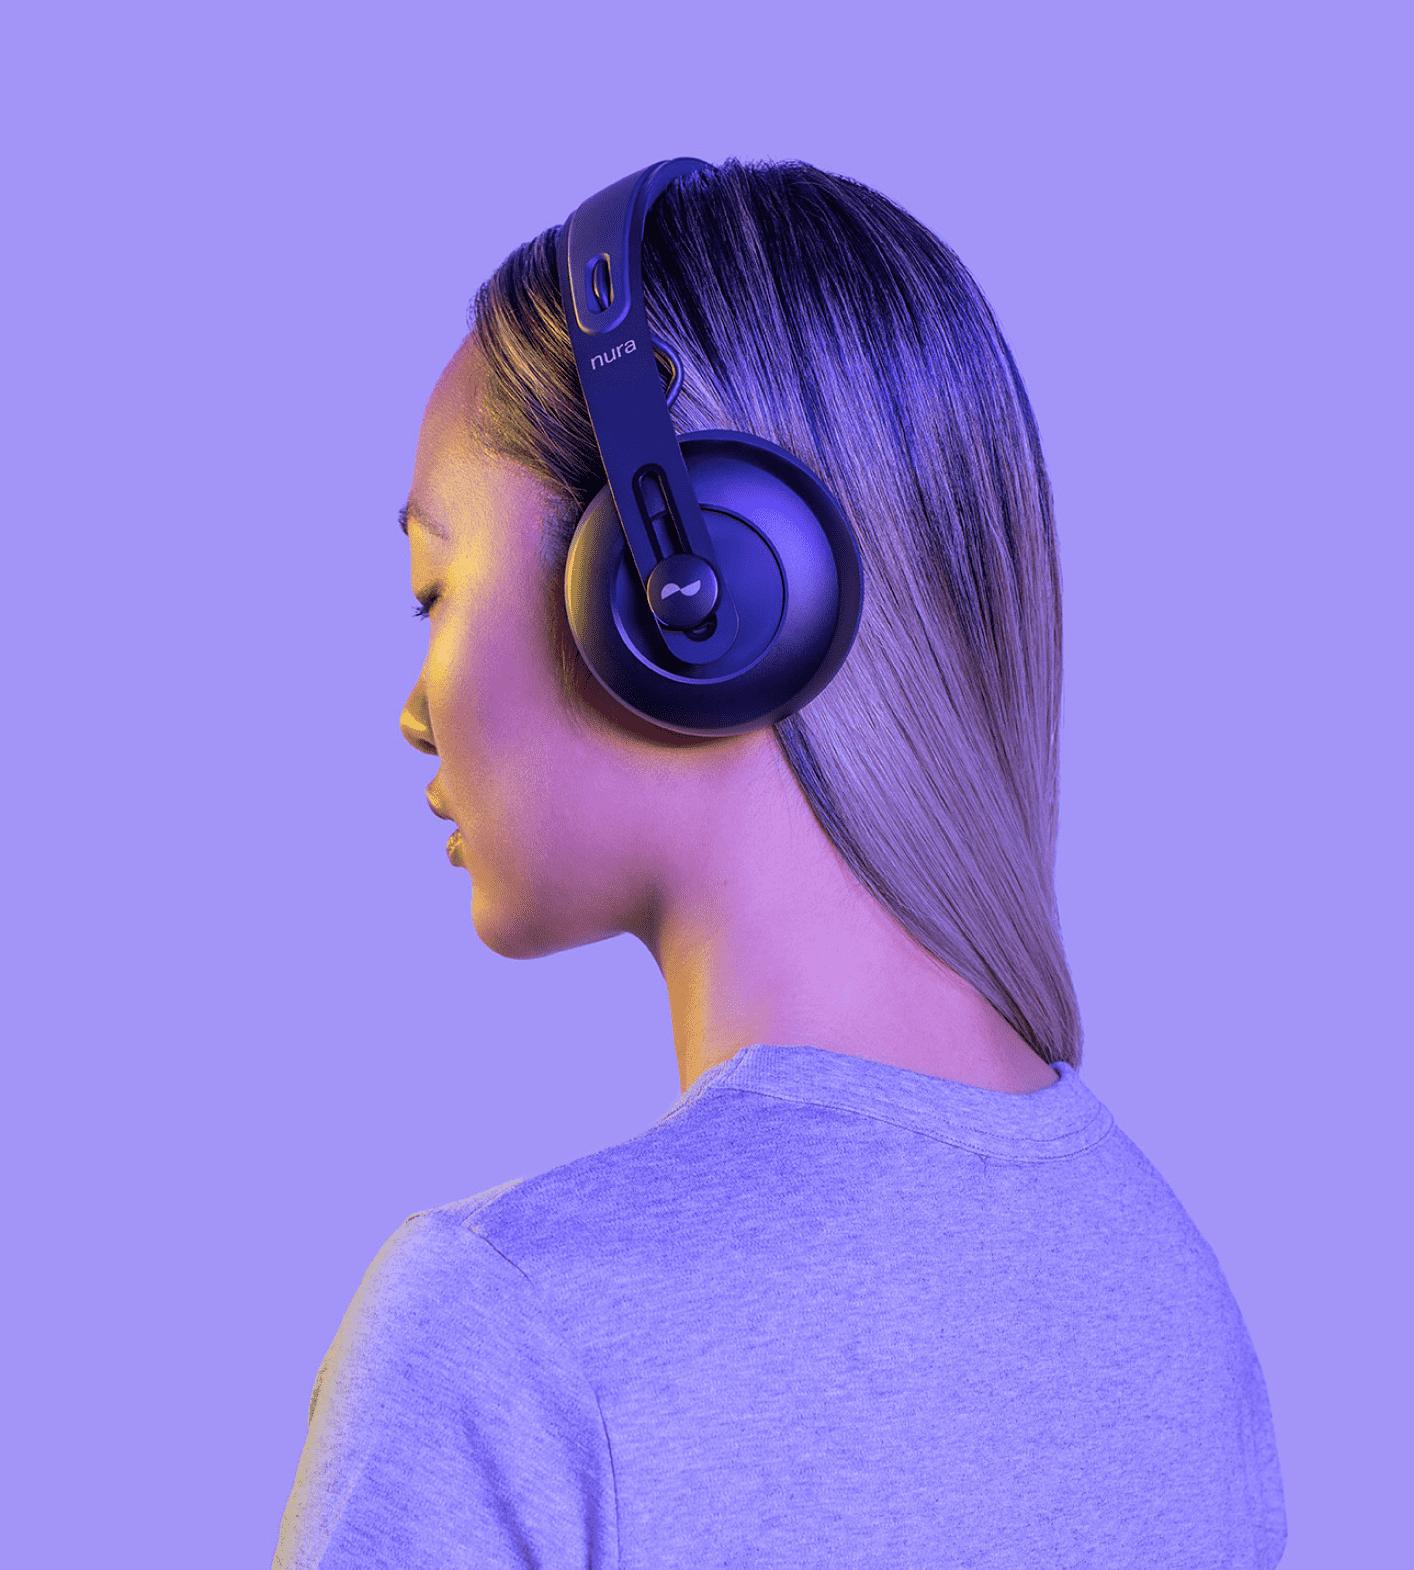 Are Nura Headphones Good? NuraLoop and NuraPhone